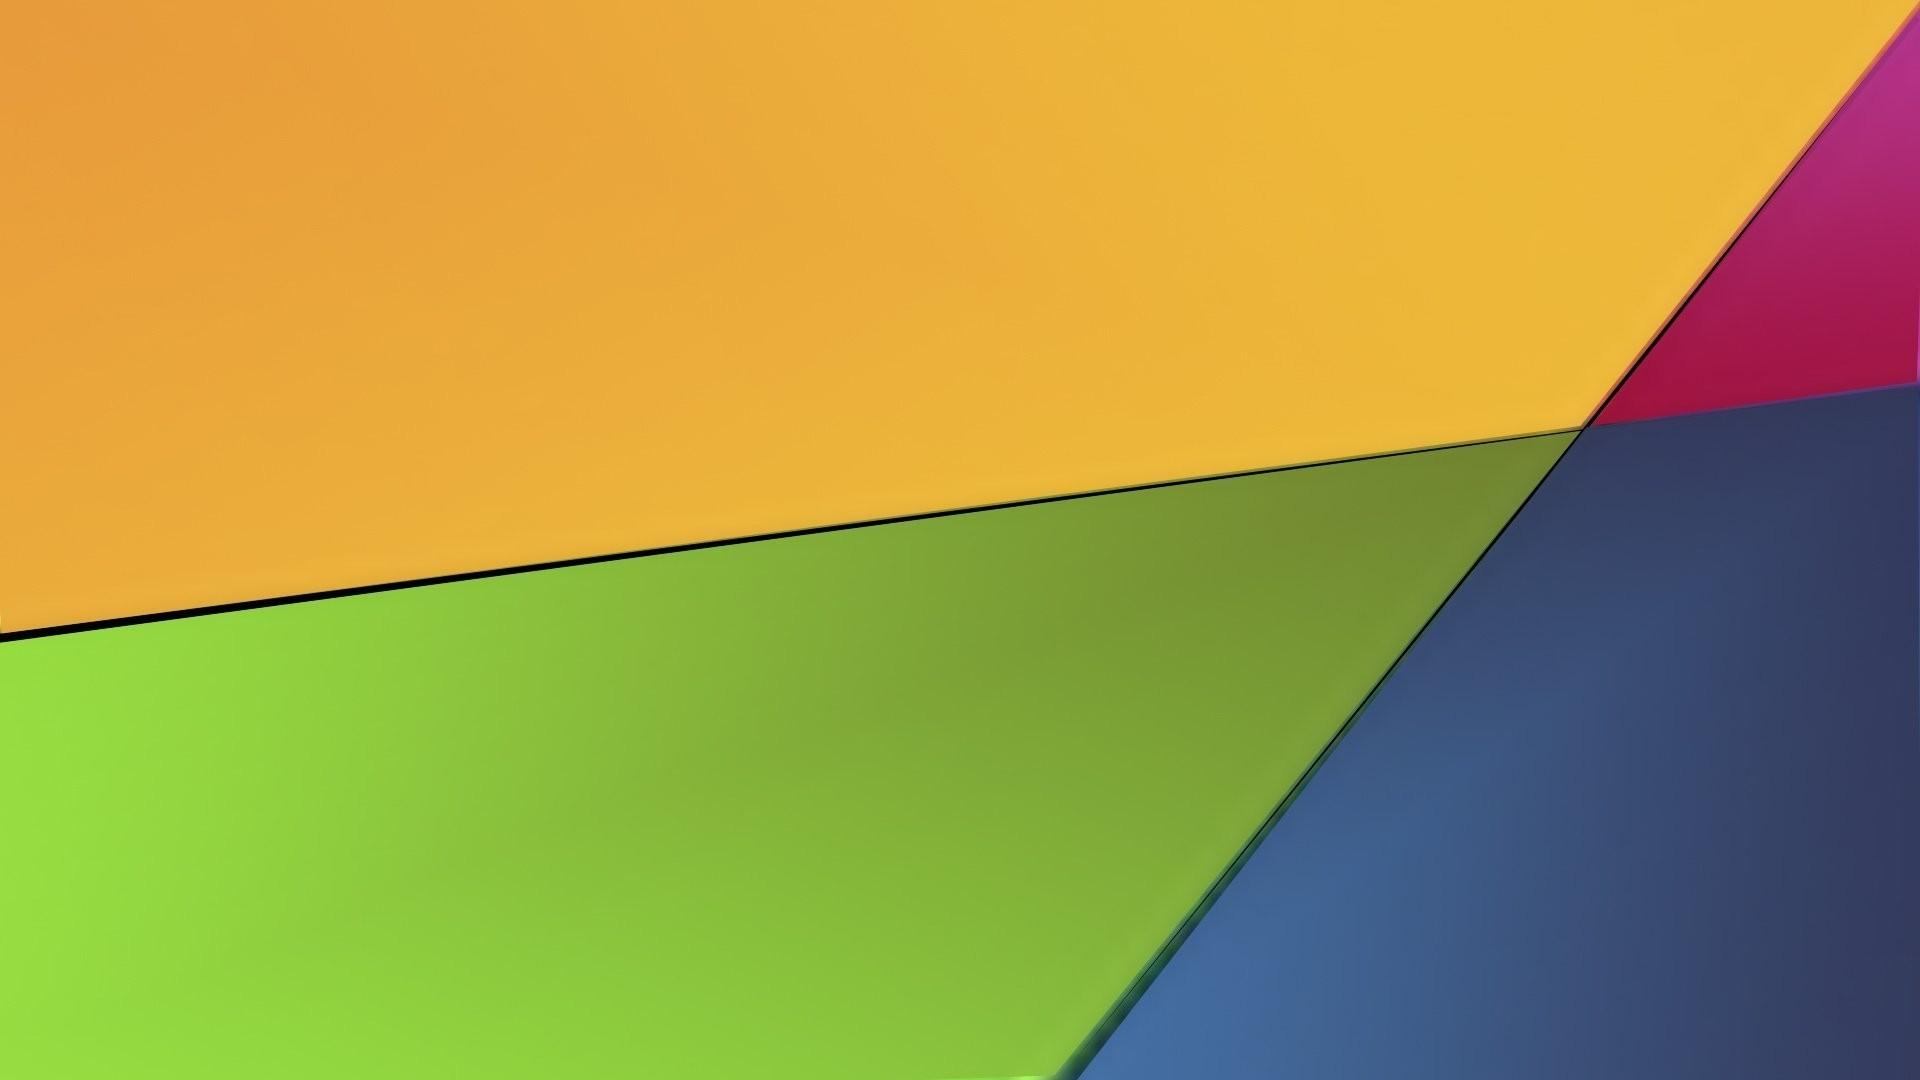 Chromebook PC Wallpaper